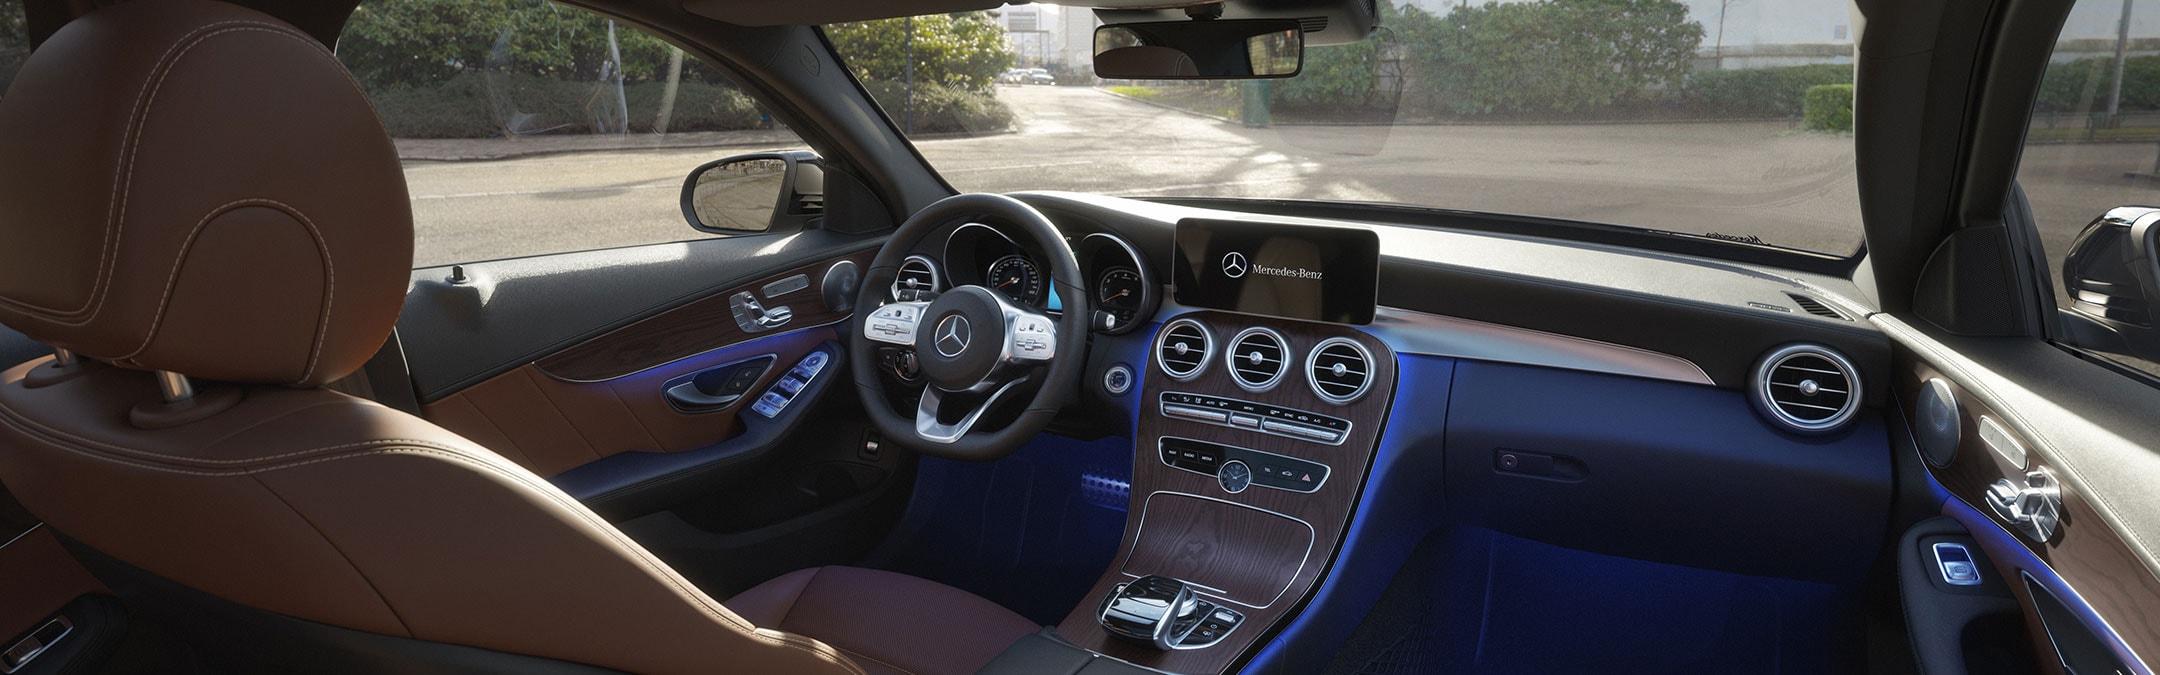 2019 Mercedes Benz C Class Sedan Mercedes C 300 C 43 Amg C 63 Amg